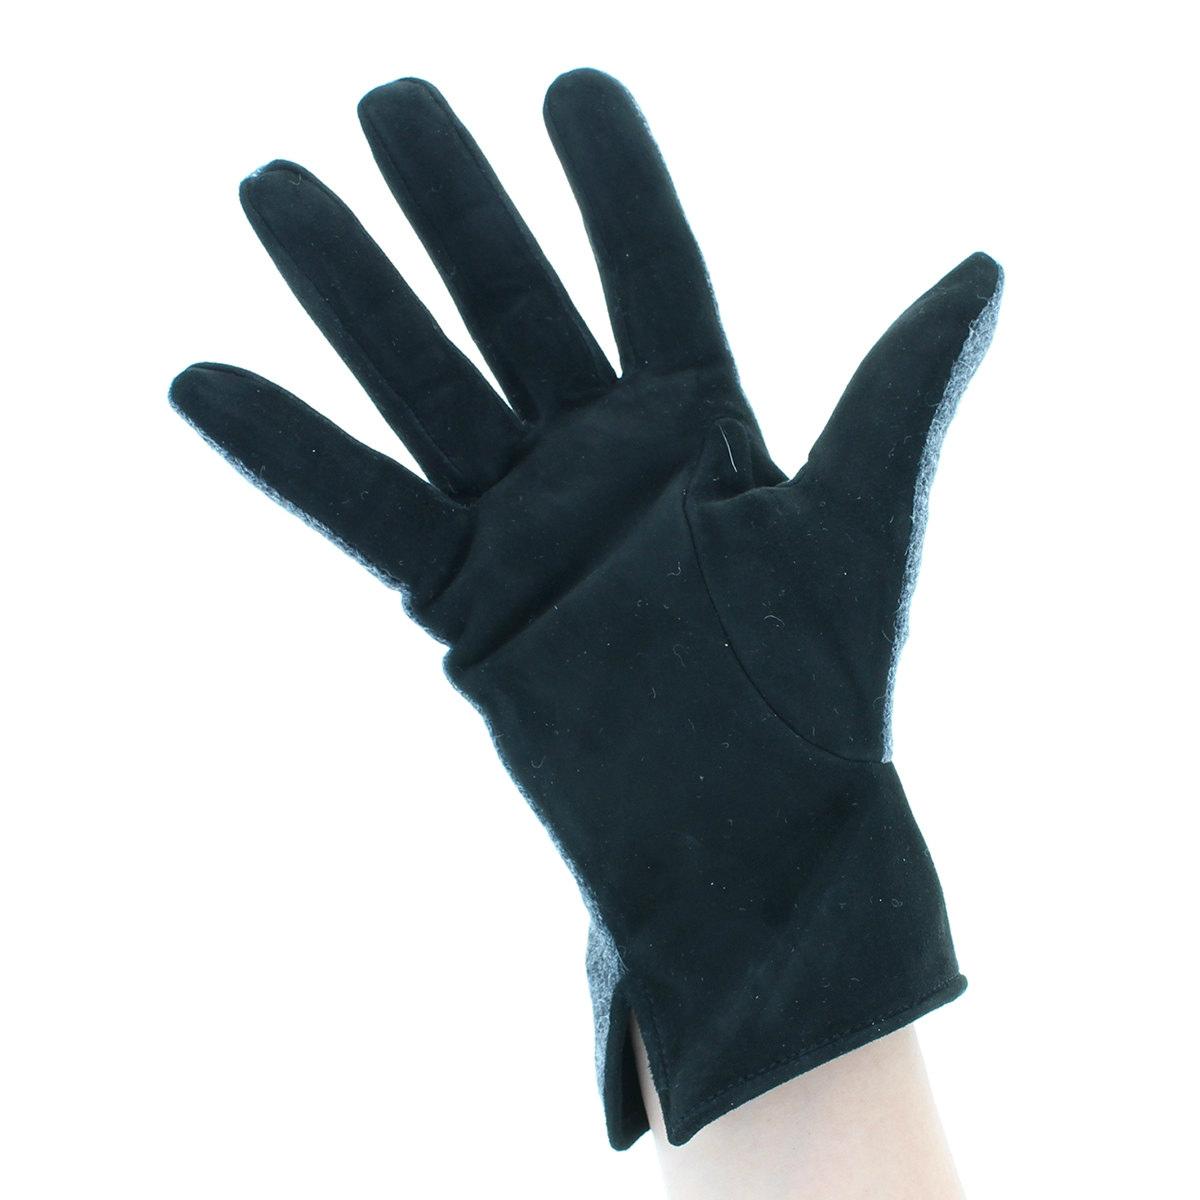 【SALE】ダックス DAKS レディース 革手袋 甲側ウール素材 daksオリジナル テディベア ワンポイント刺繍 掌側 スエード 羊革 裾スリット入り Mサイズ MLサイズ 日本製